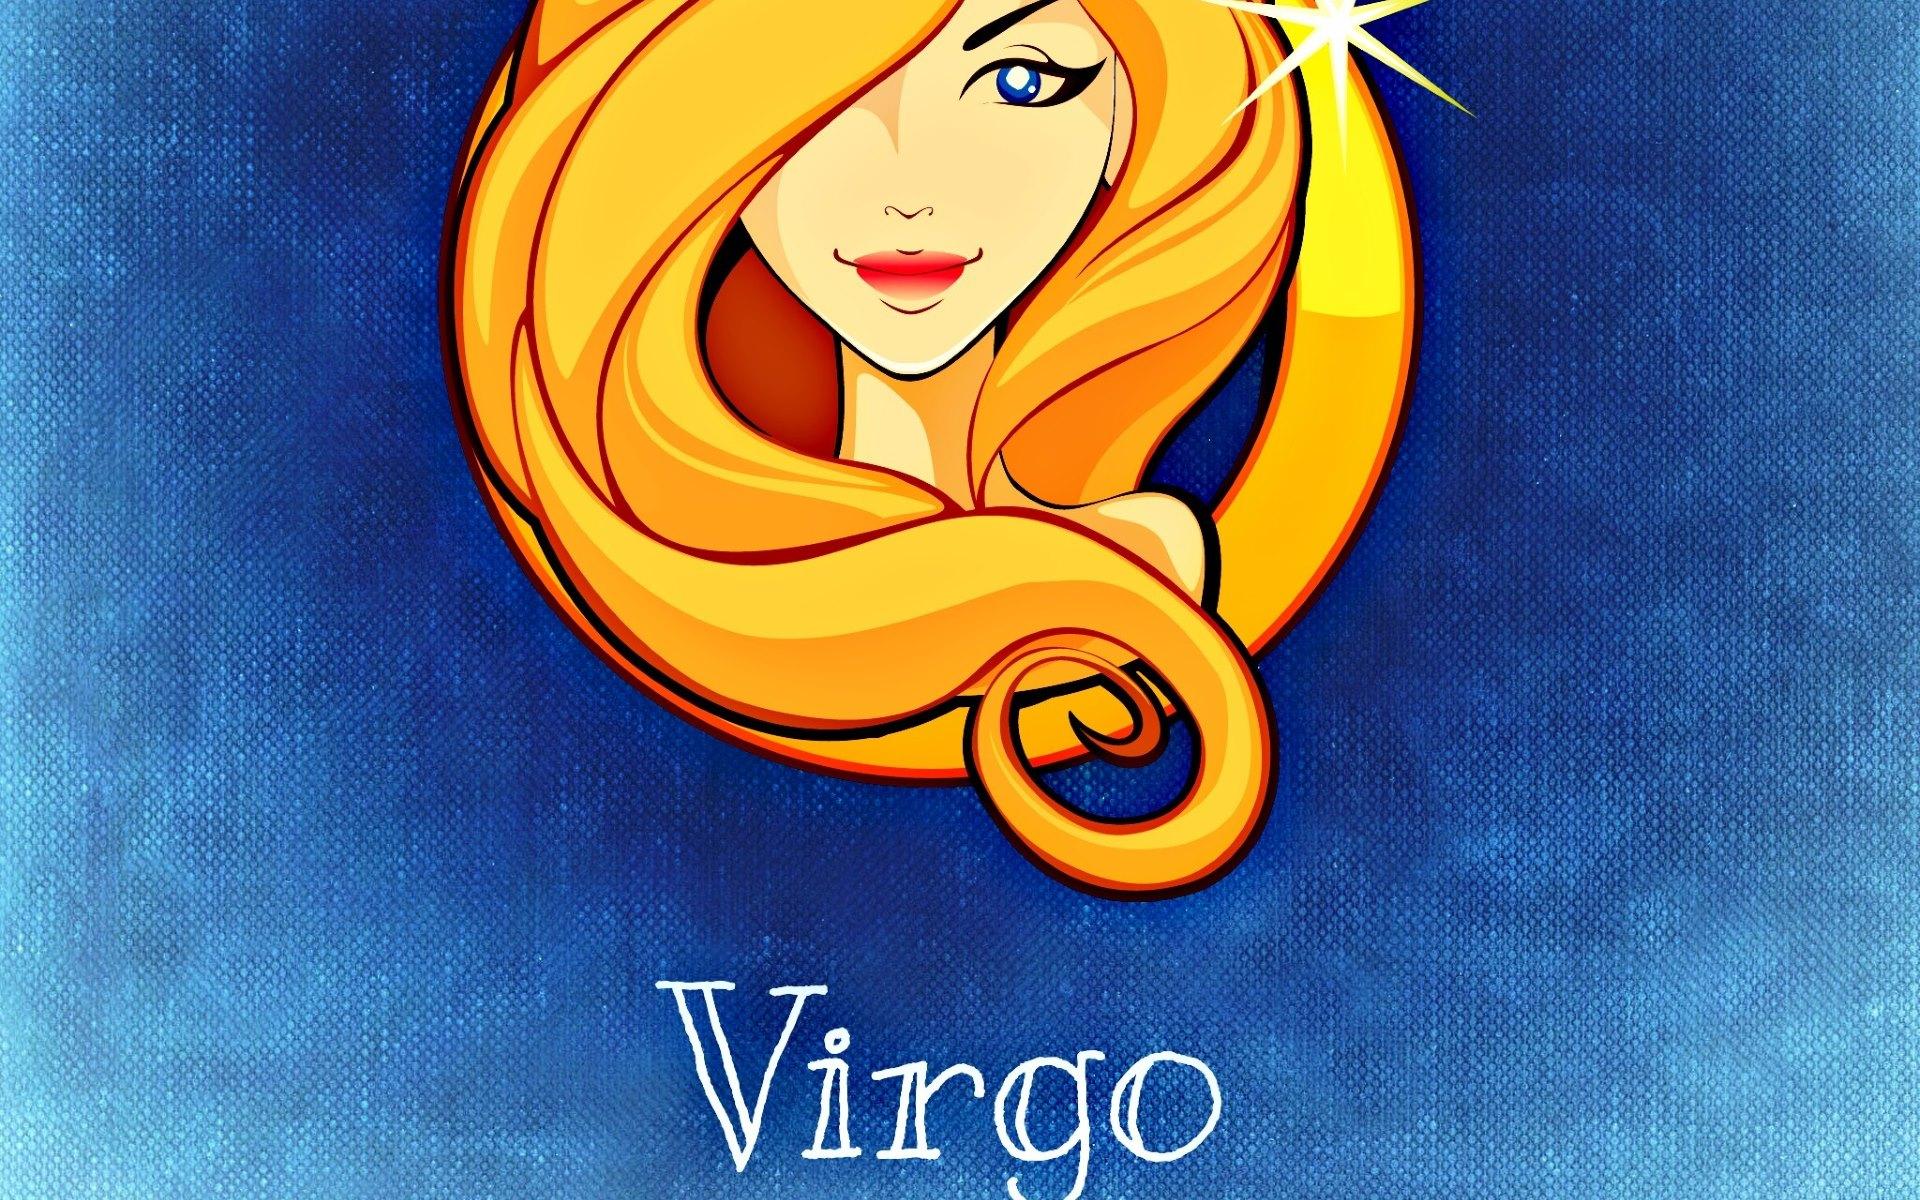 Horoscope Virgo Hd Wallpaper Background Image